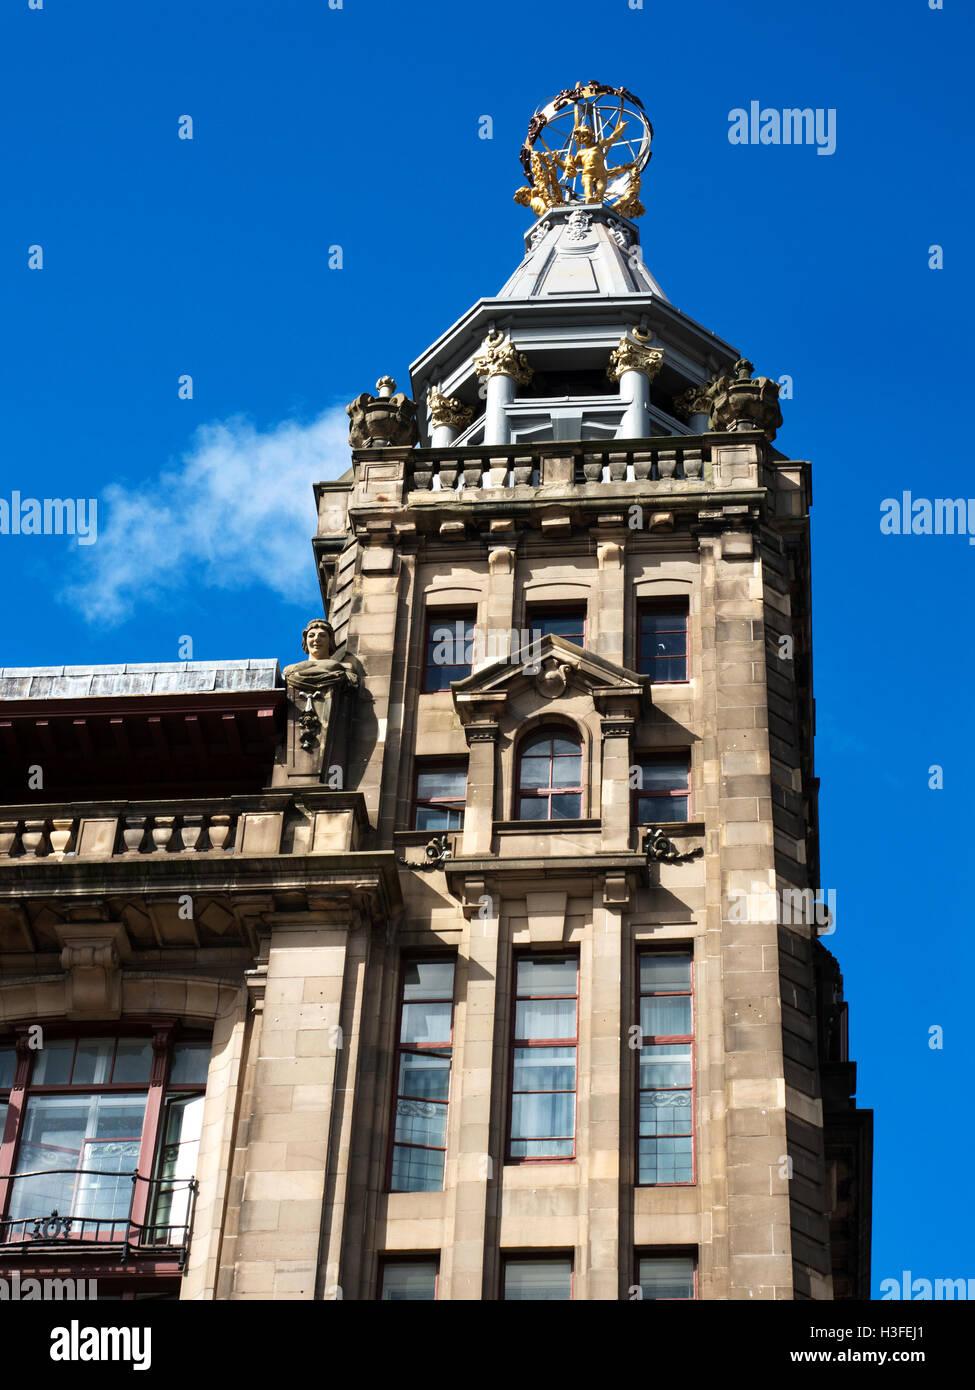 RW Forsyth Sphere atop the former R W Forsyth Department Store in Princes Street Edinburgh Midlothian Scotland - Stock Image